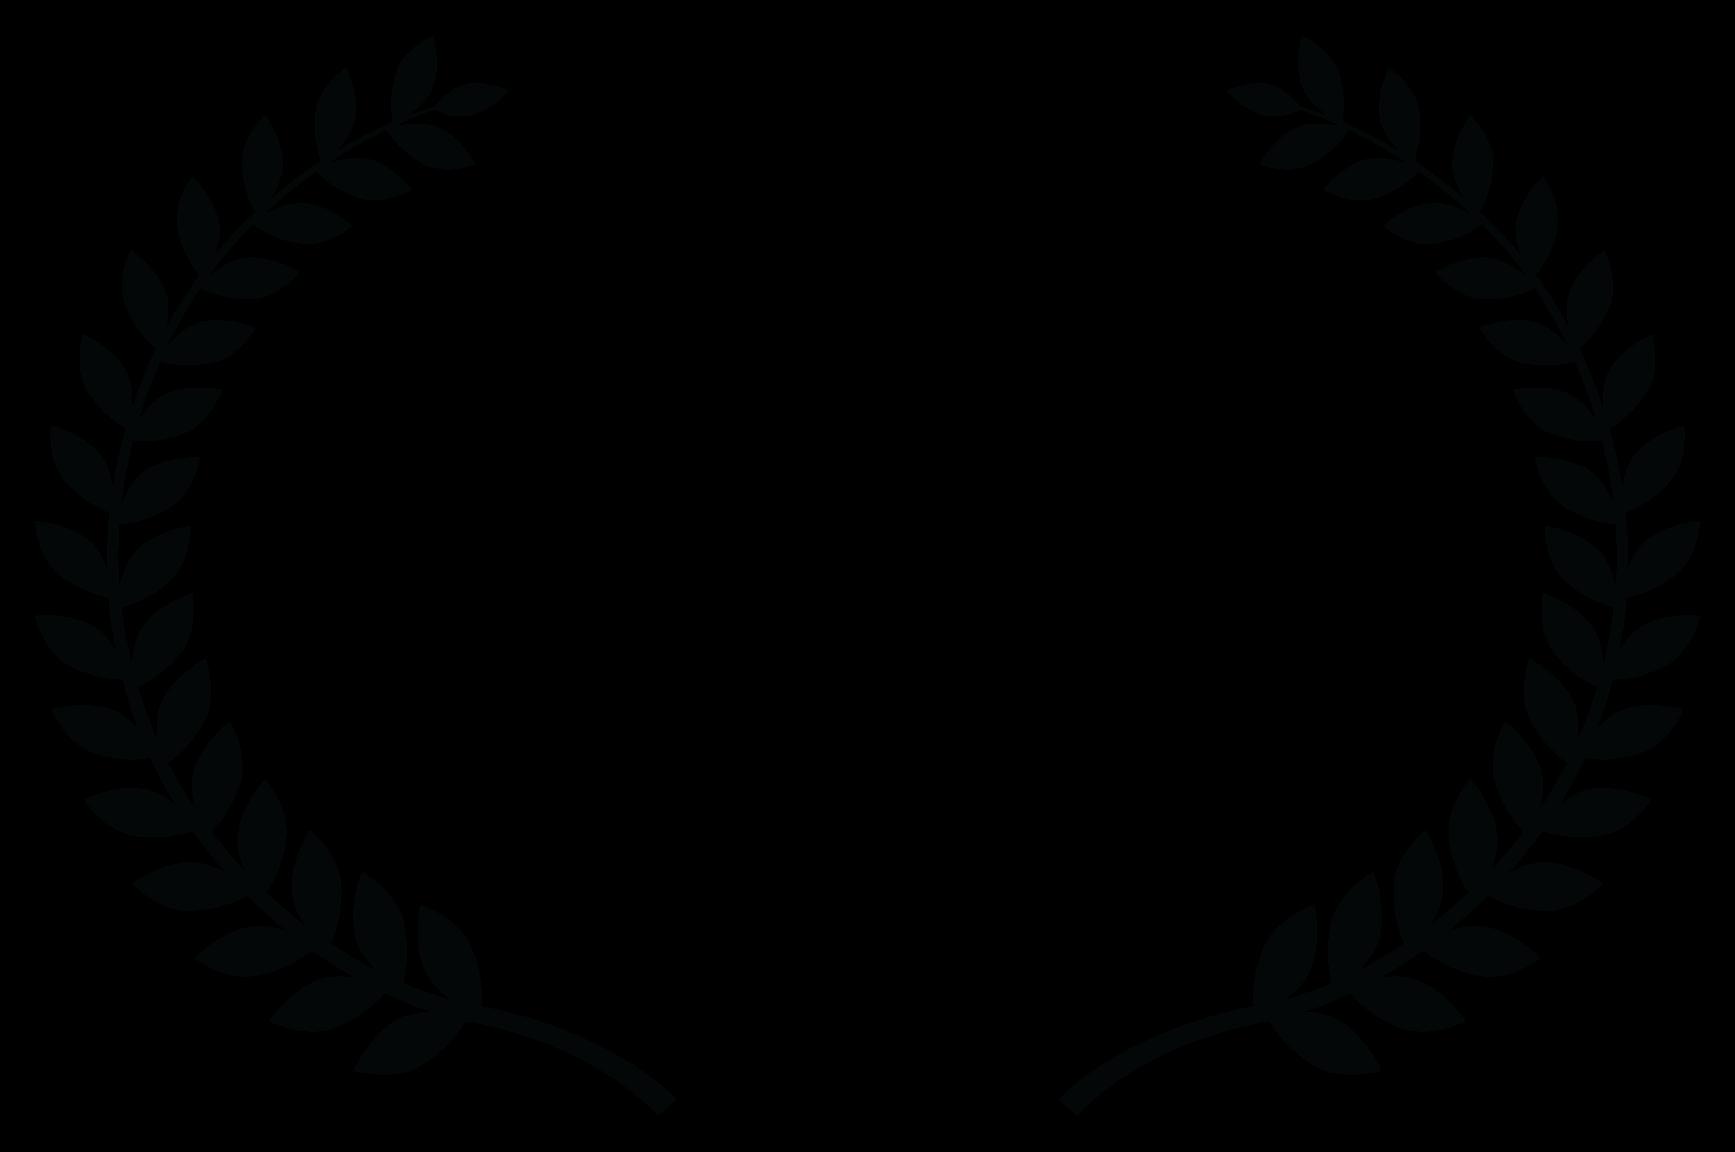 OFFICIAL SELECTION - Inshort Film Festival 2018 - 2018.png